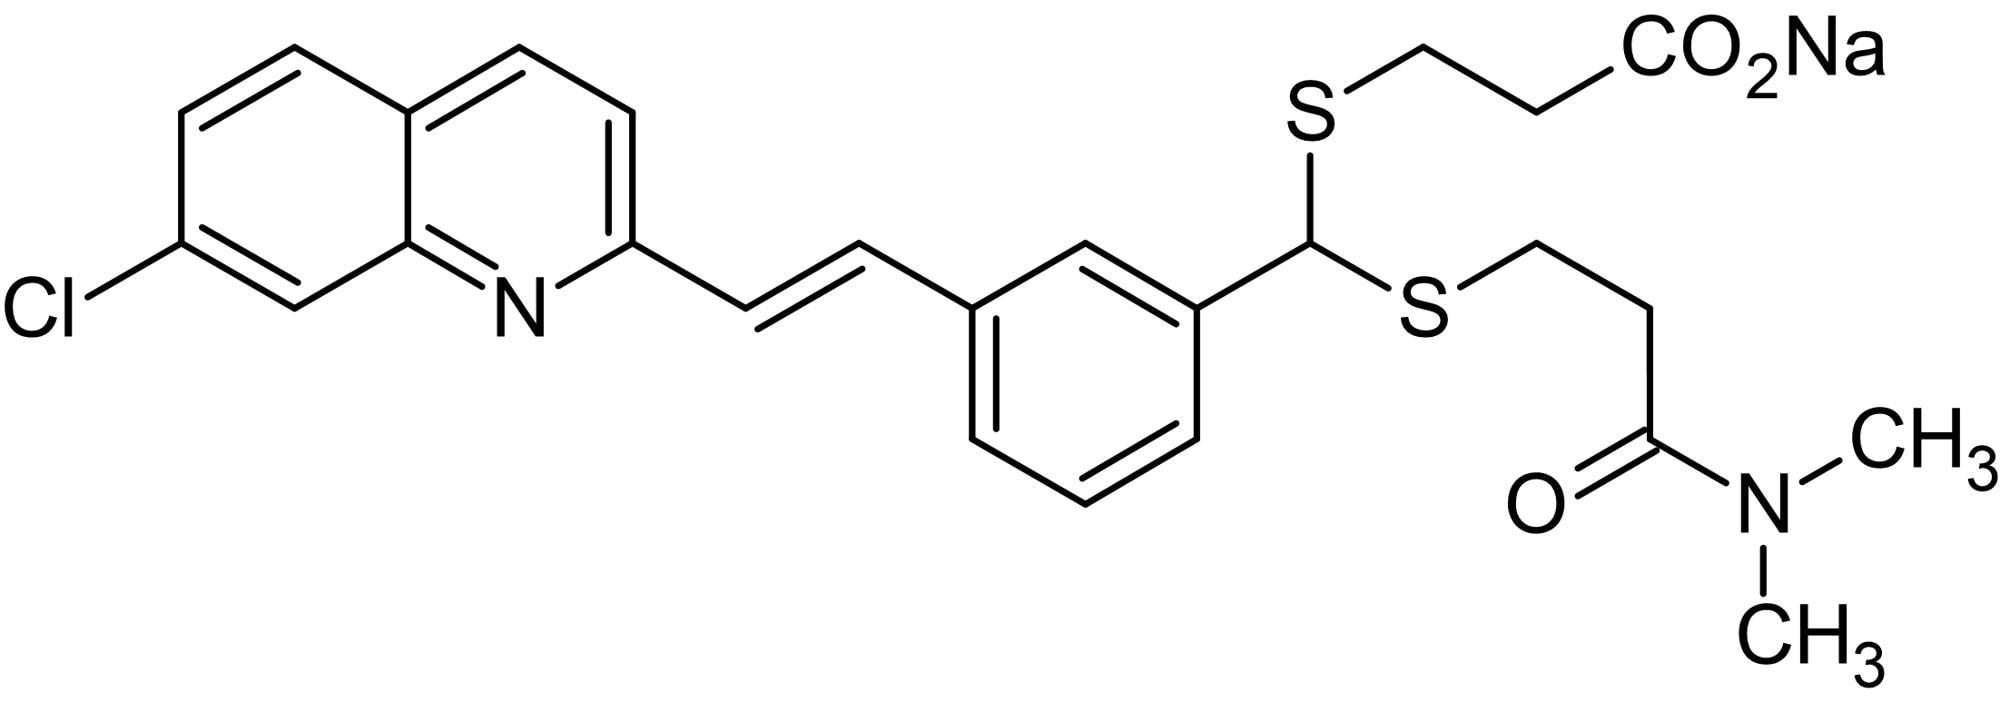 Chemical Structure - MK 571 sodium salt (L 660711 sodium salt), CysLT<sub>1</sub>&nbsp;receptor antagonist (ab144303)